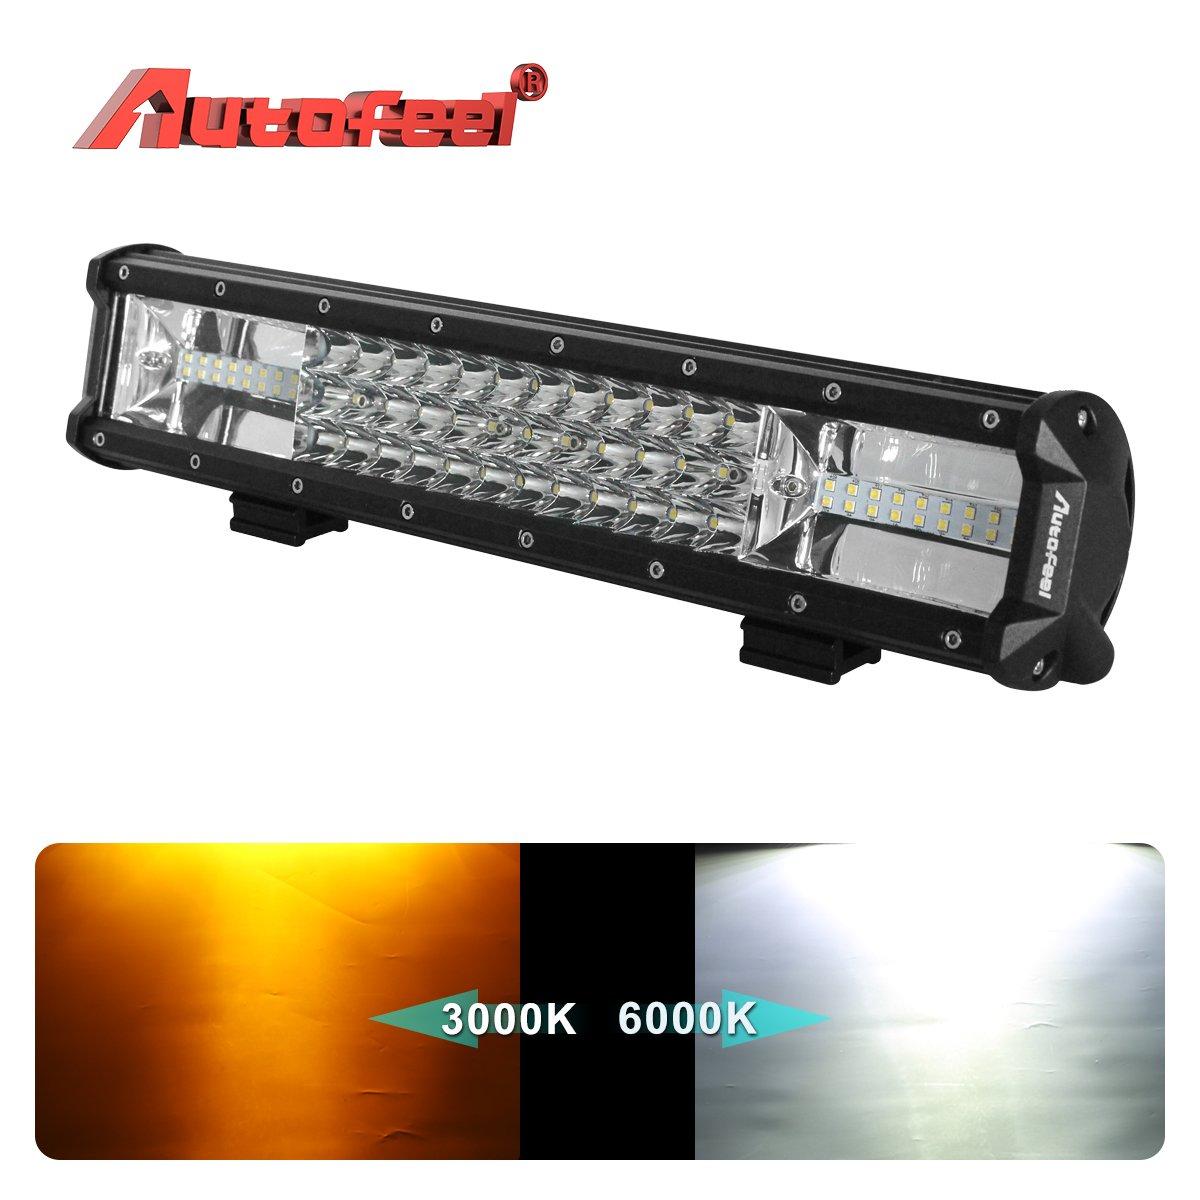 MICTUNING MIC-5DP30 2X SR-Mini Series 8 30W Single Row CREE LED Light Bar Combo Spot Flood 2700lm 400m Visibility